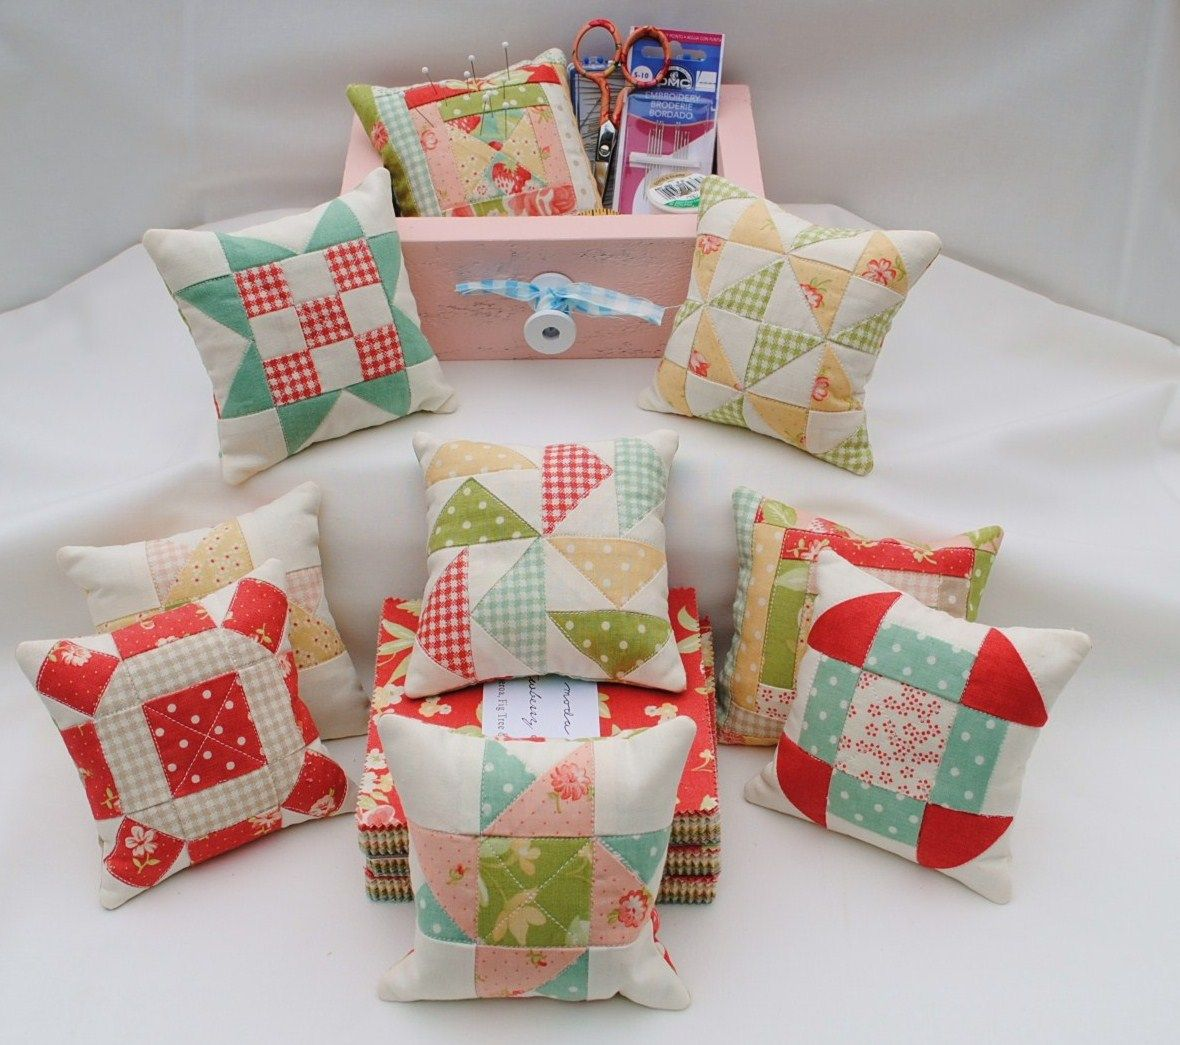 Piccoli Cuscini.Cuscini Piccoli Pincushion Fun Charm Quilt Pin Cushions